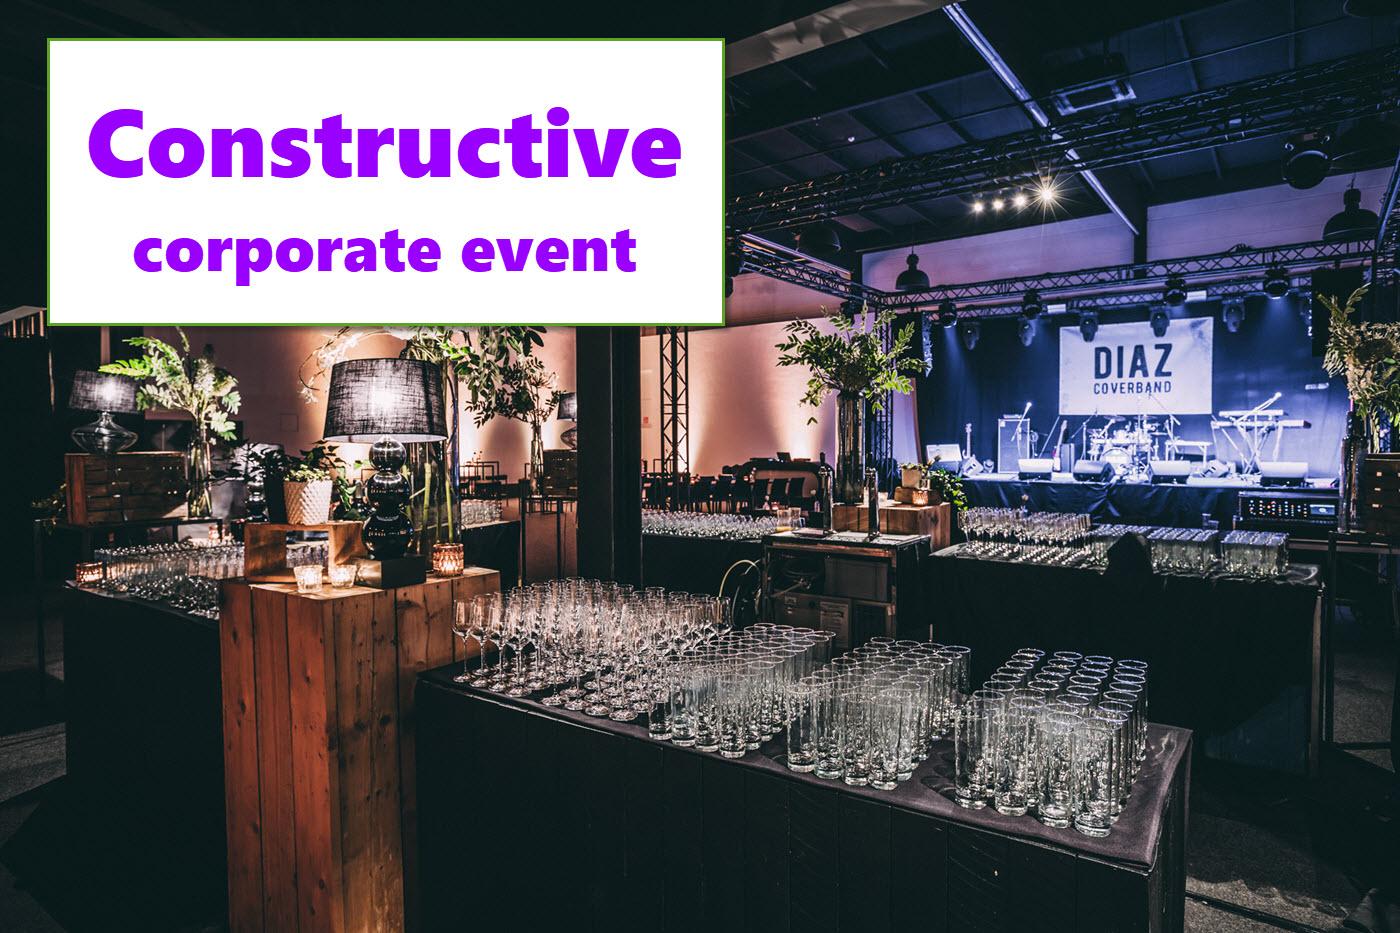 Corporate event Constructive